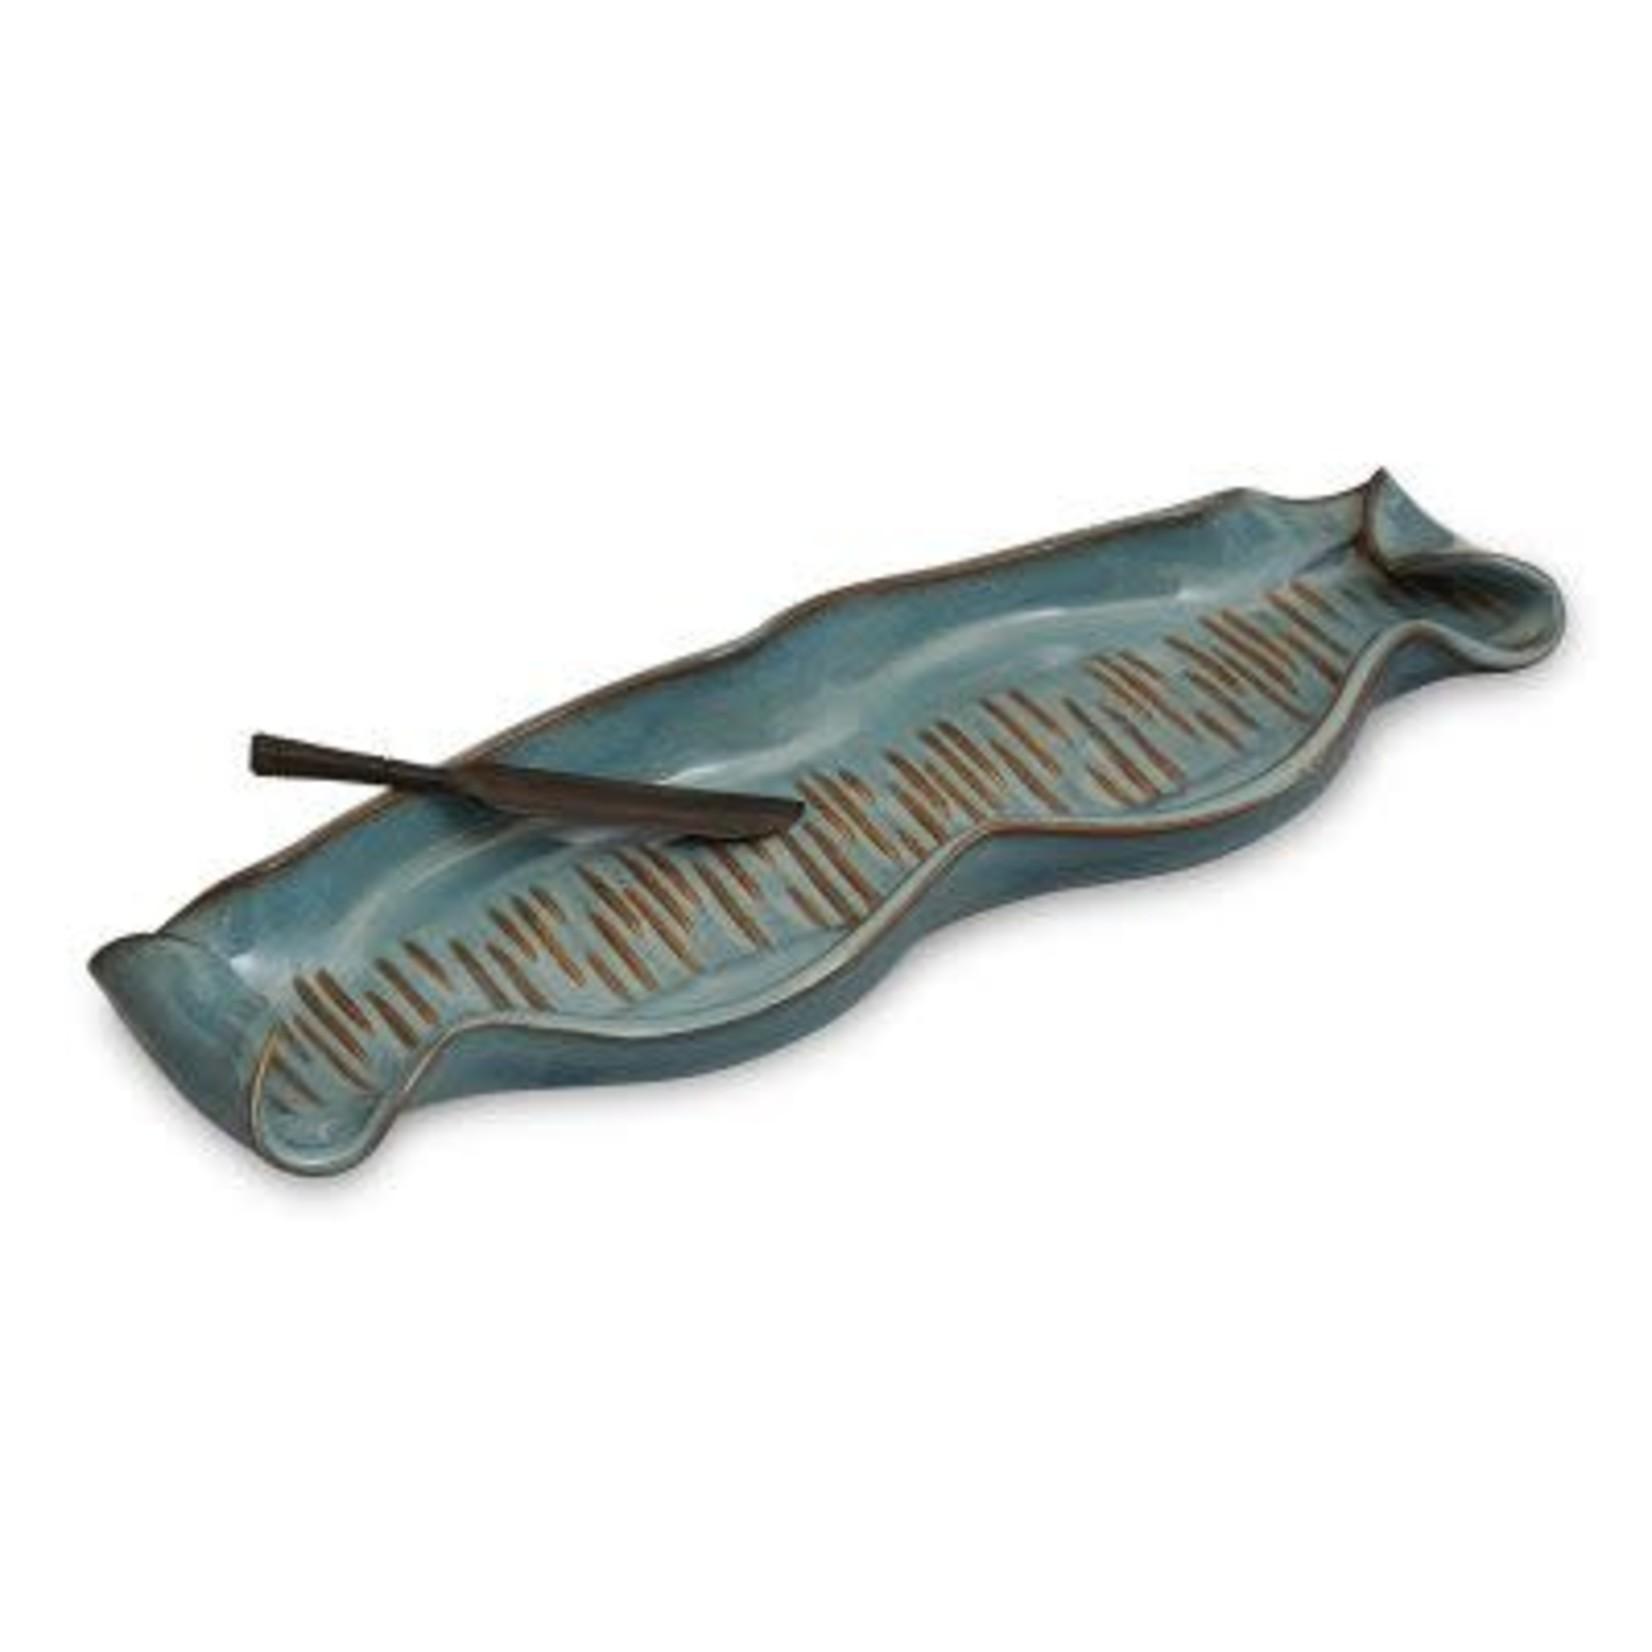 Hilborn Pottery Design Baguette Tray